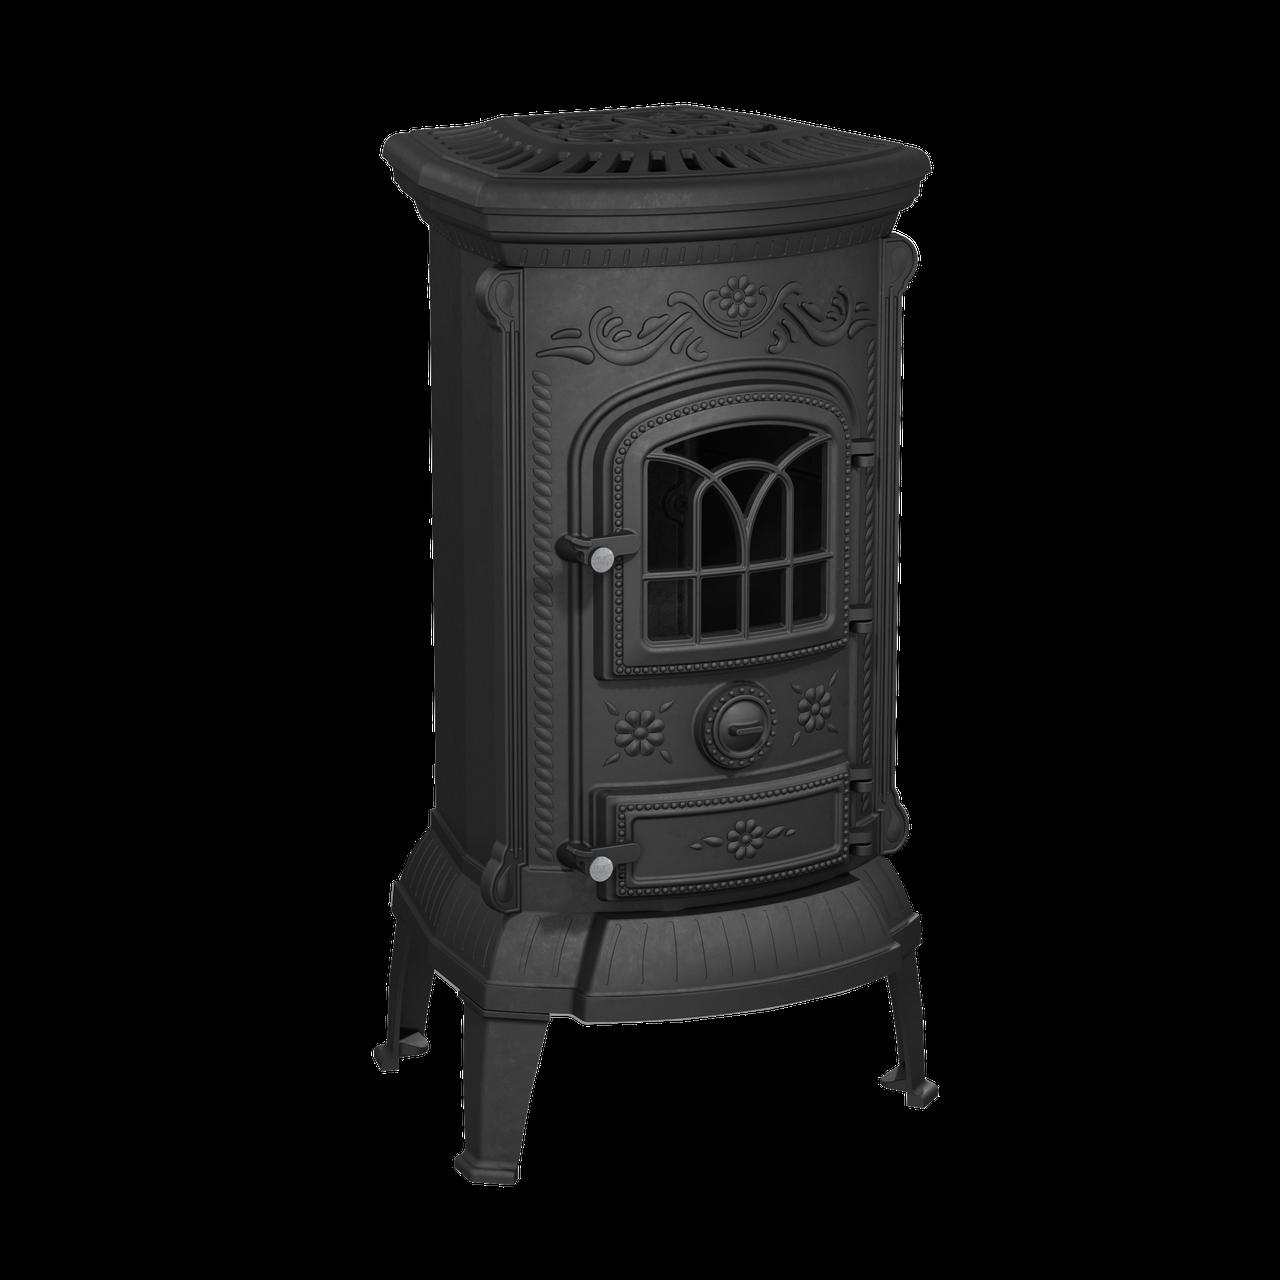 Печь чугунная Nordflam Verdo (9 кВт)